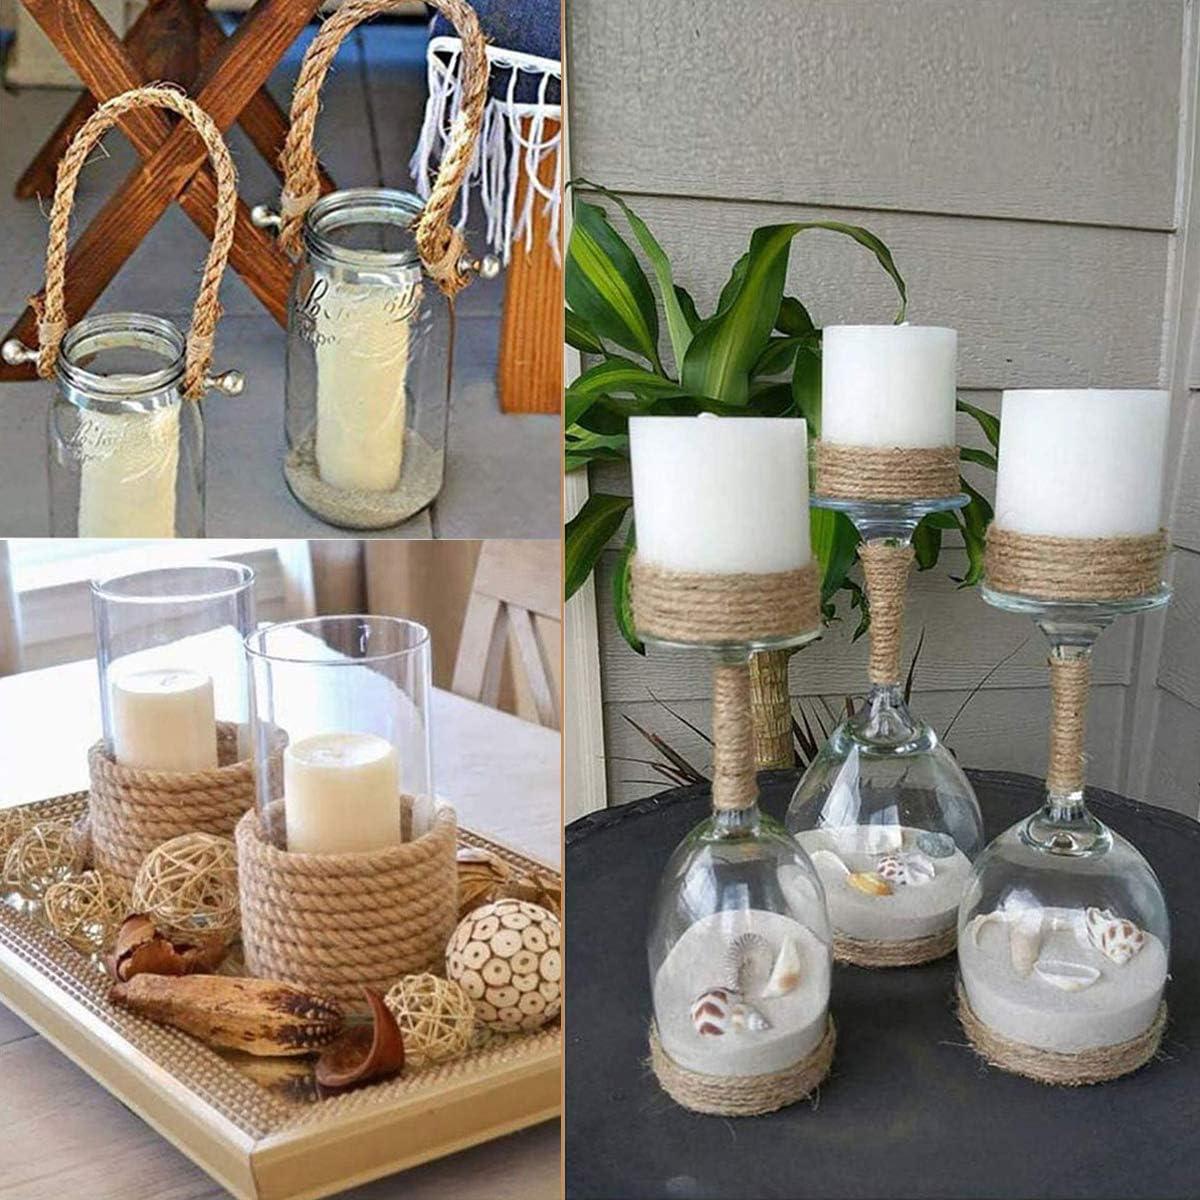 Hemp Rope 20M Natural Jute Craft Cord for DIY Crafts Decoration 3MM